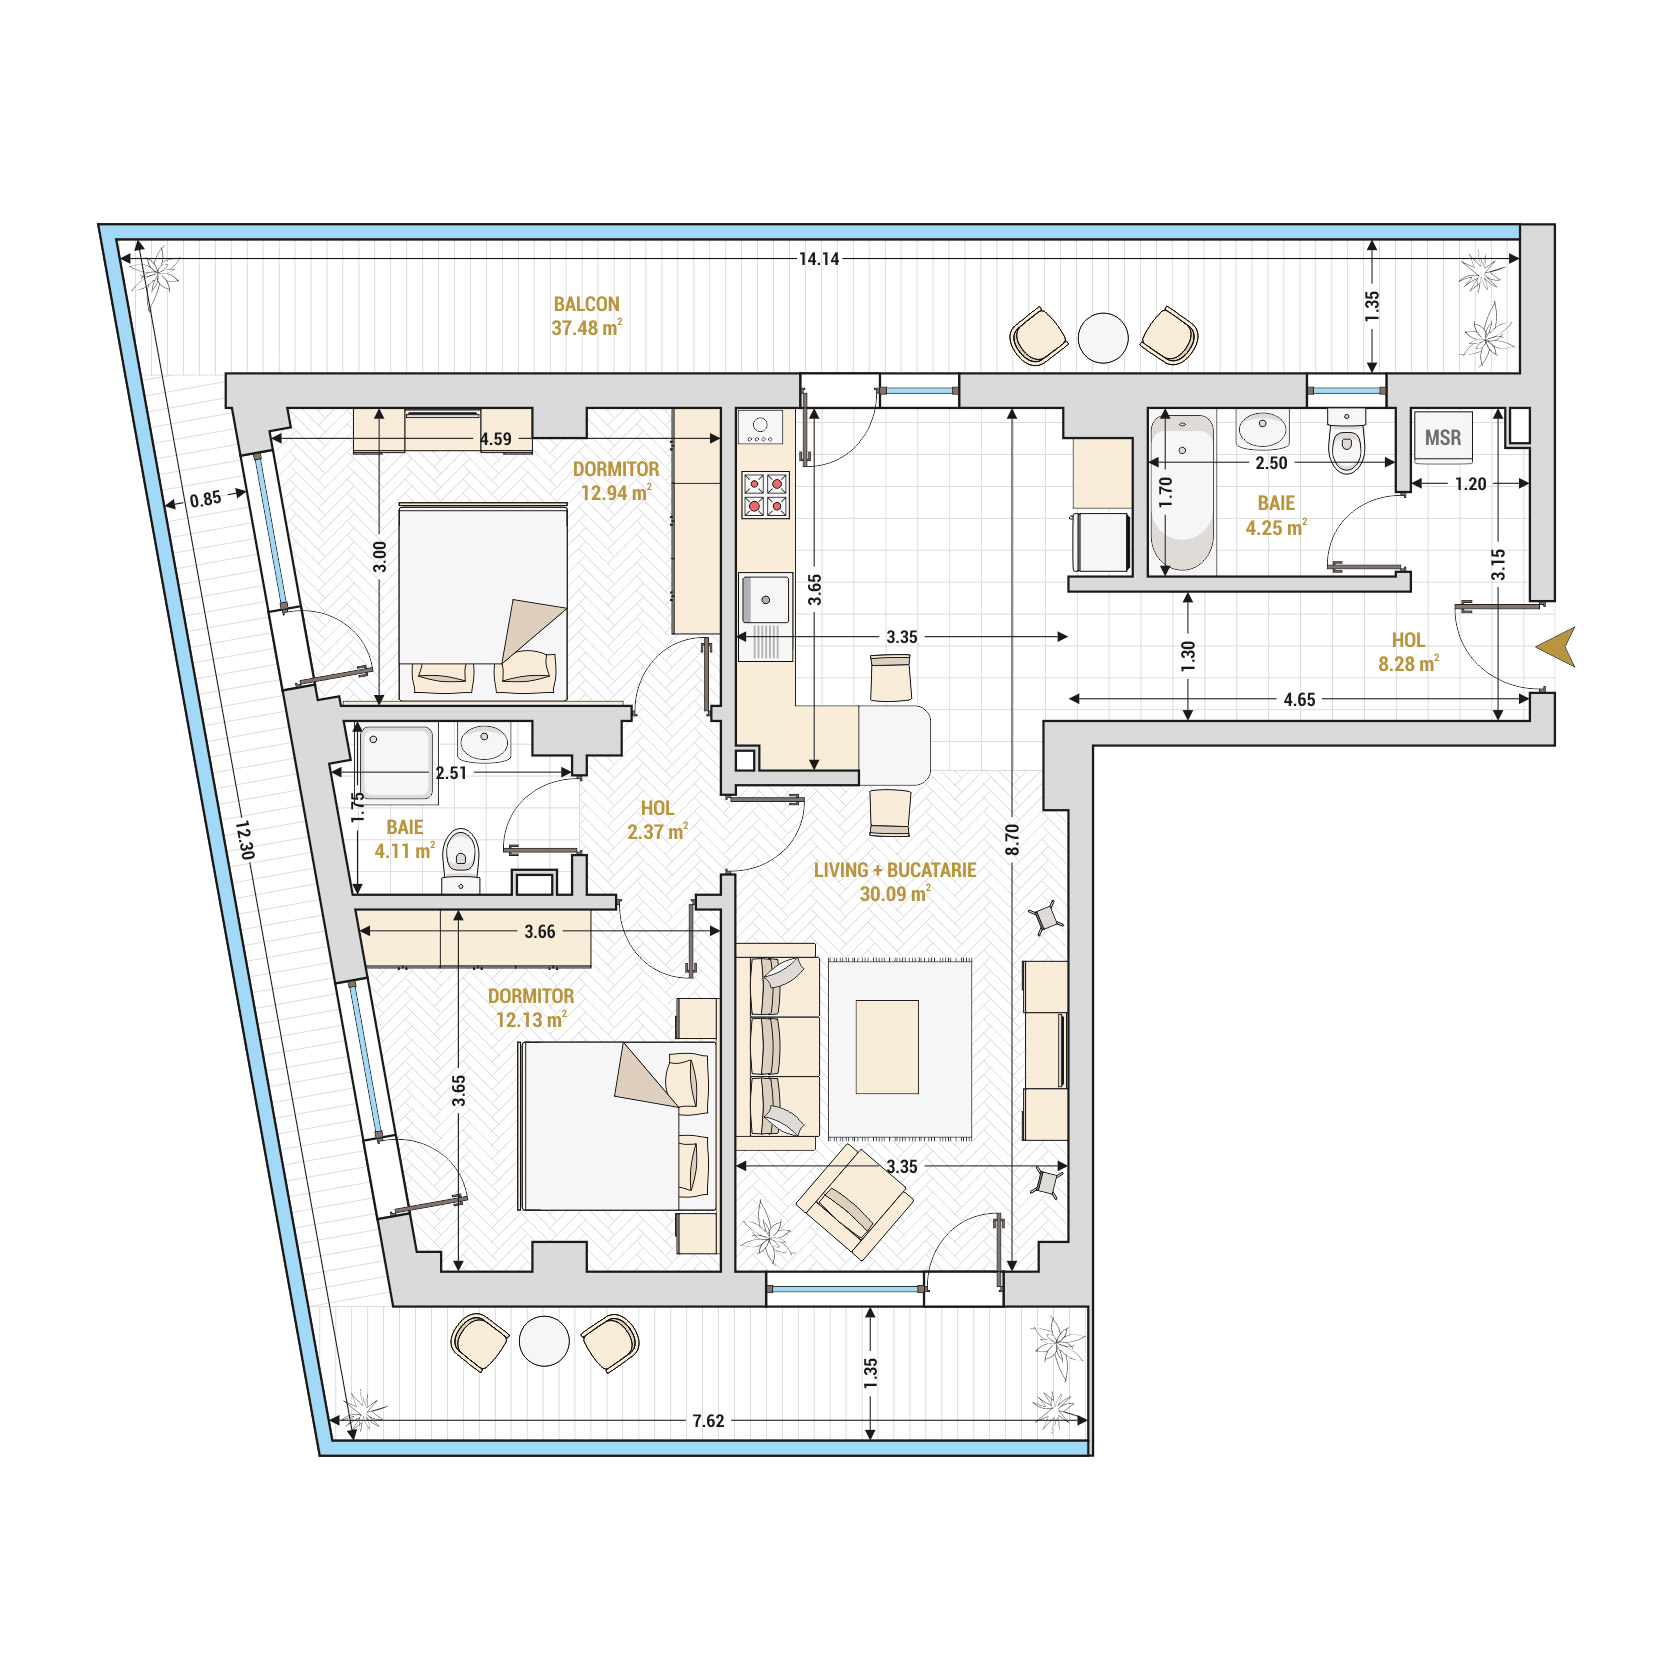 Apartament 3 camere de vanzare Bucuresti - Catedral Residence - Marriott, Piata Unirii, 13 Septembrie, Izvor - Tip 1 - T1